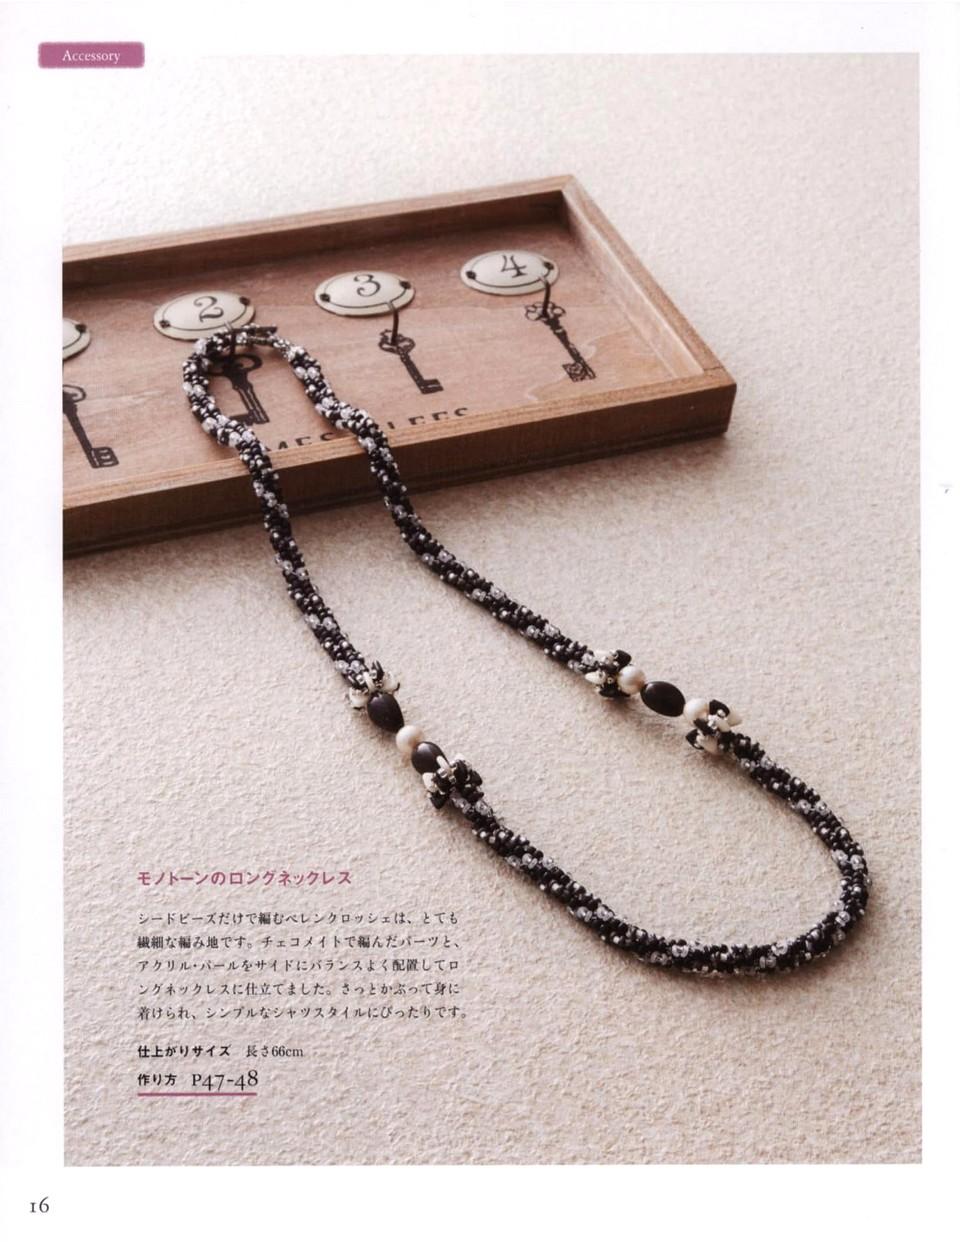 717 Beads Crochet 17-17